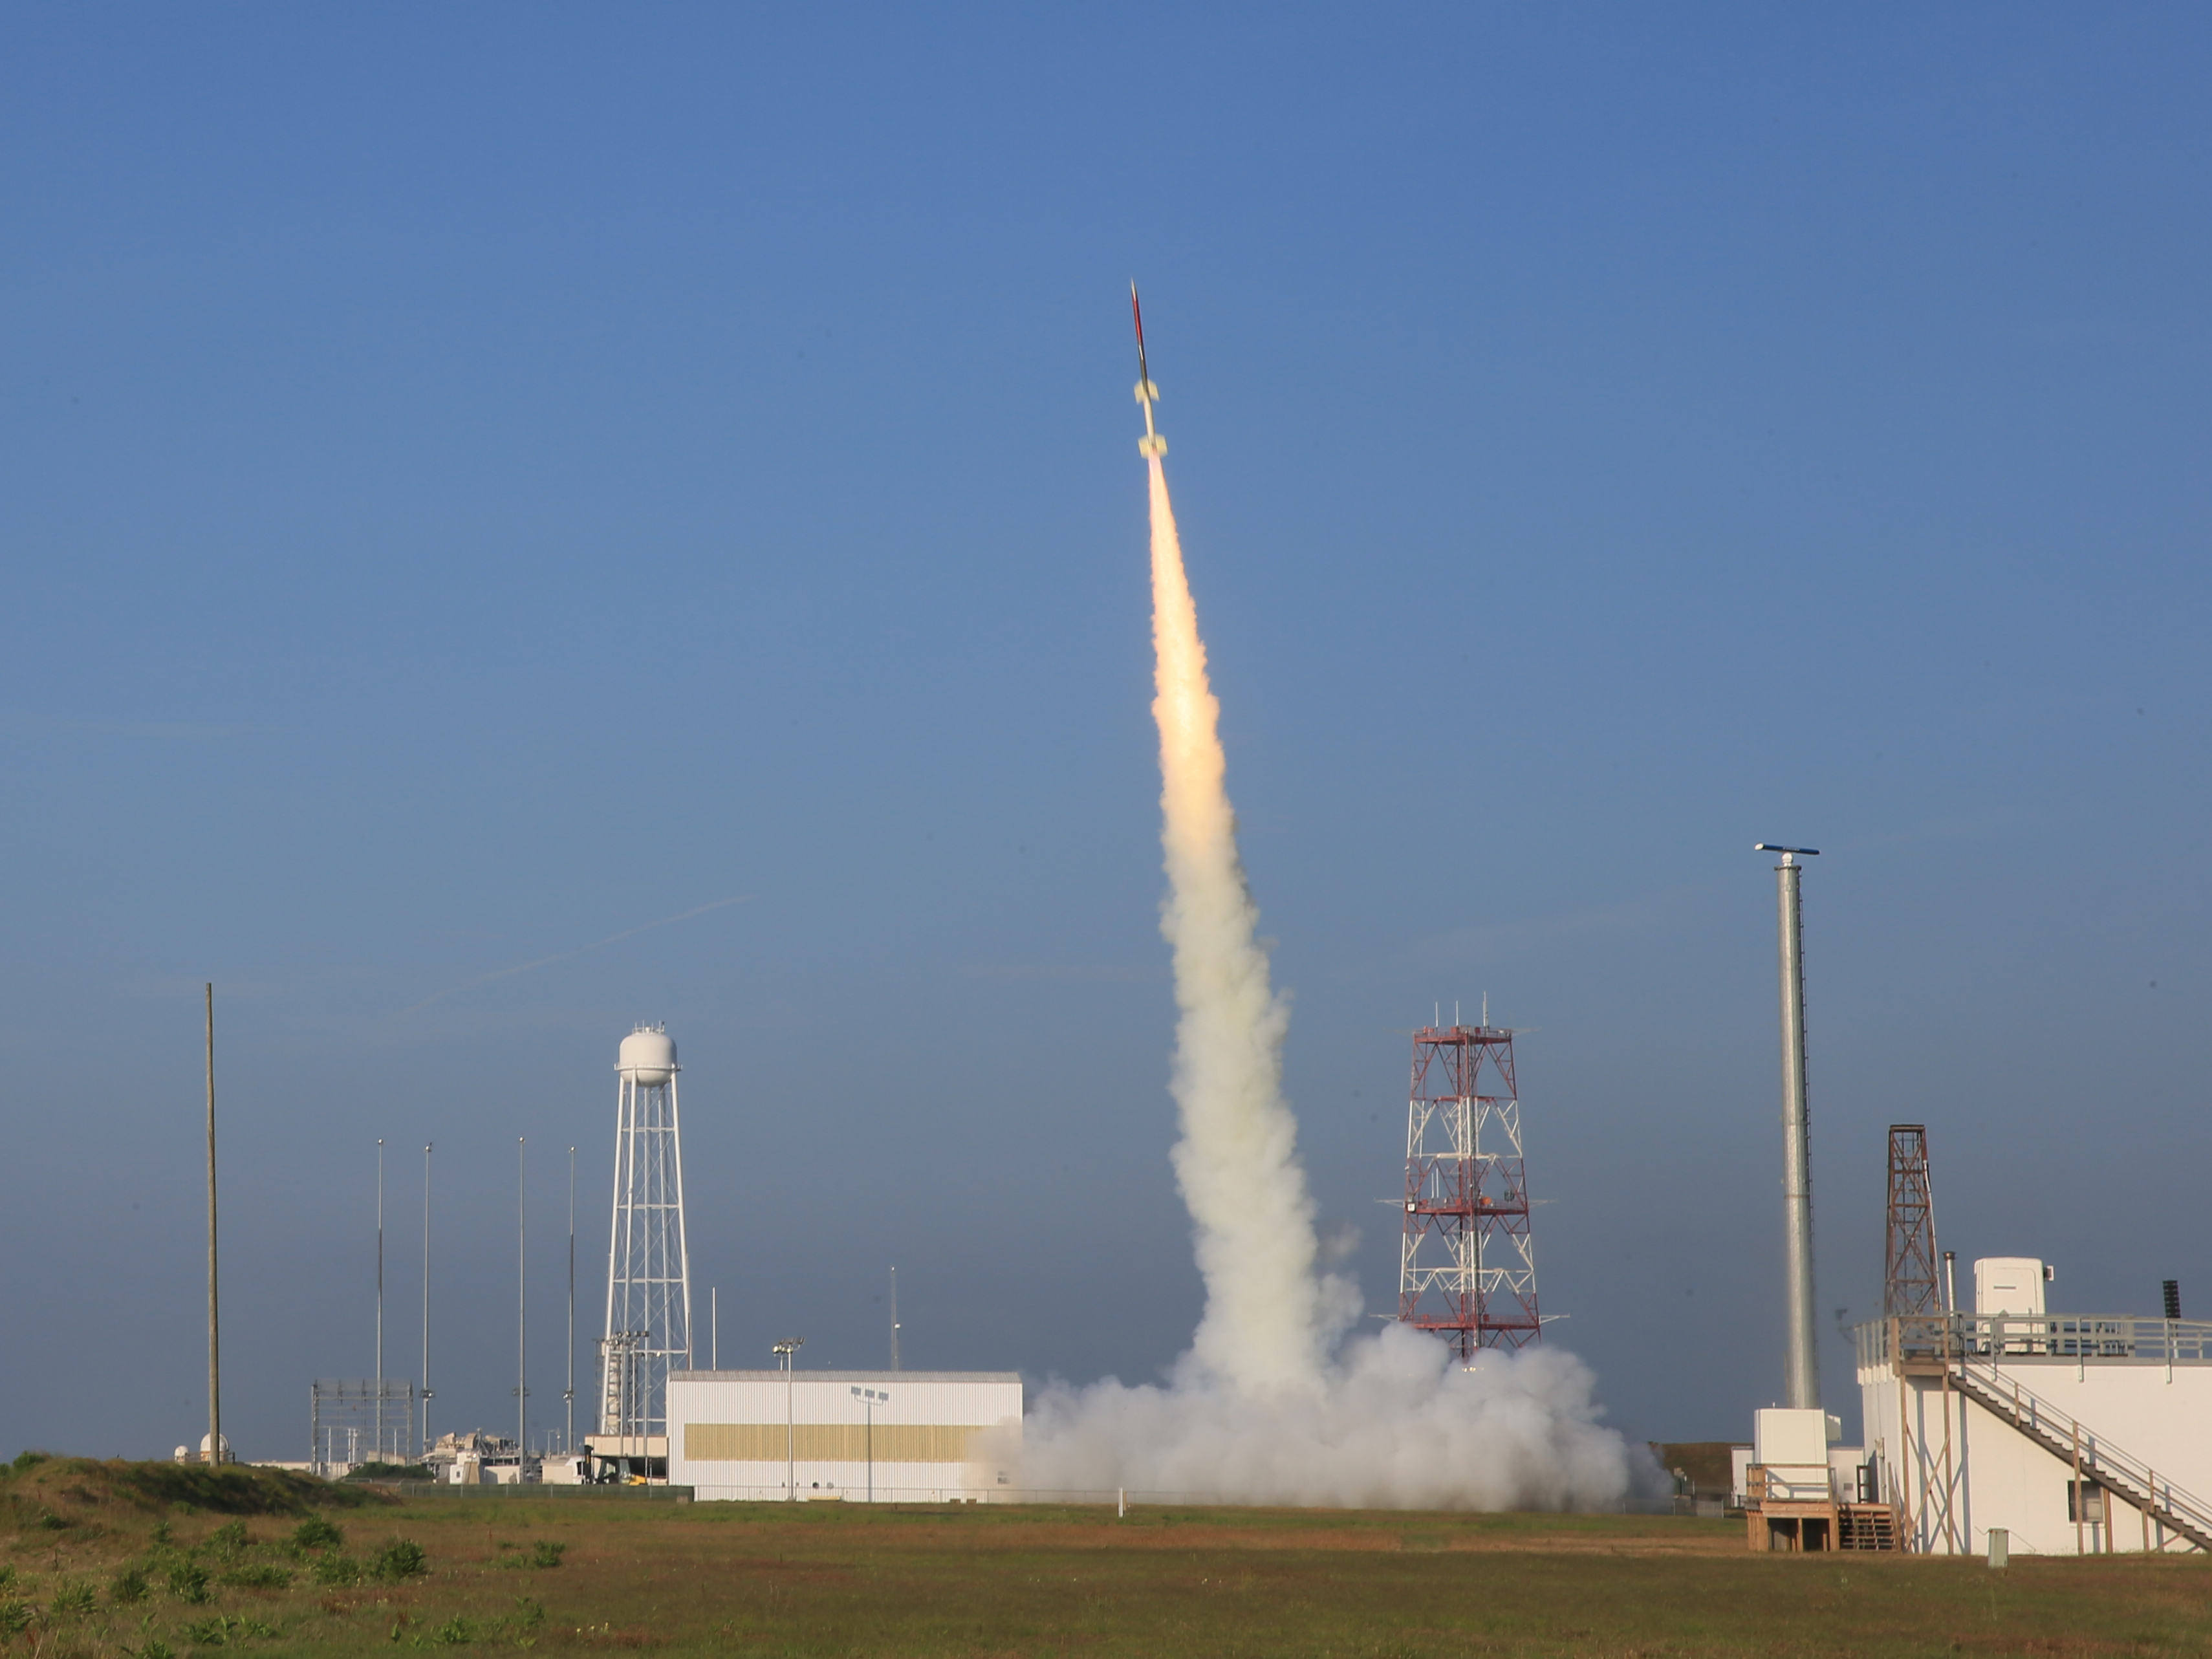 nasa wallops rocket launch - photo #39